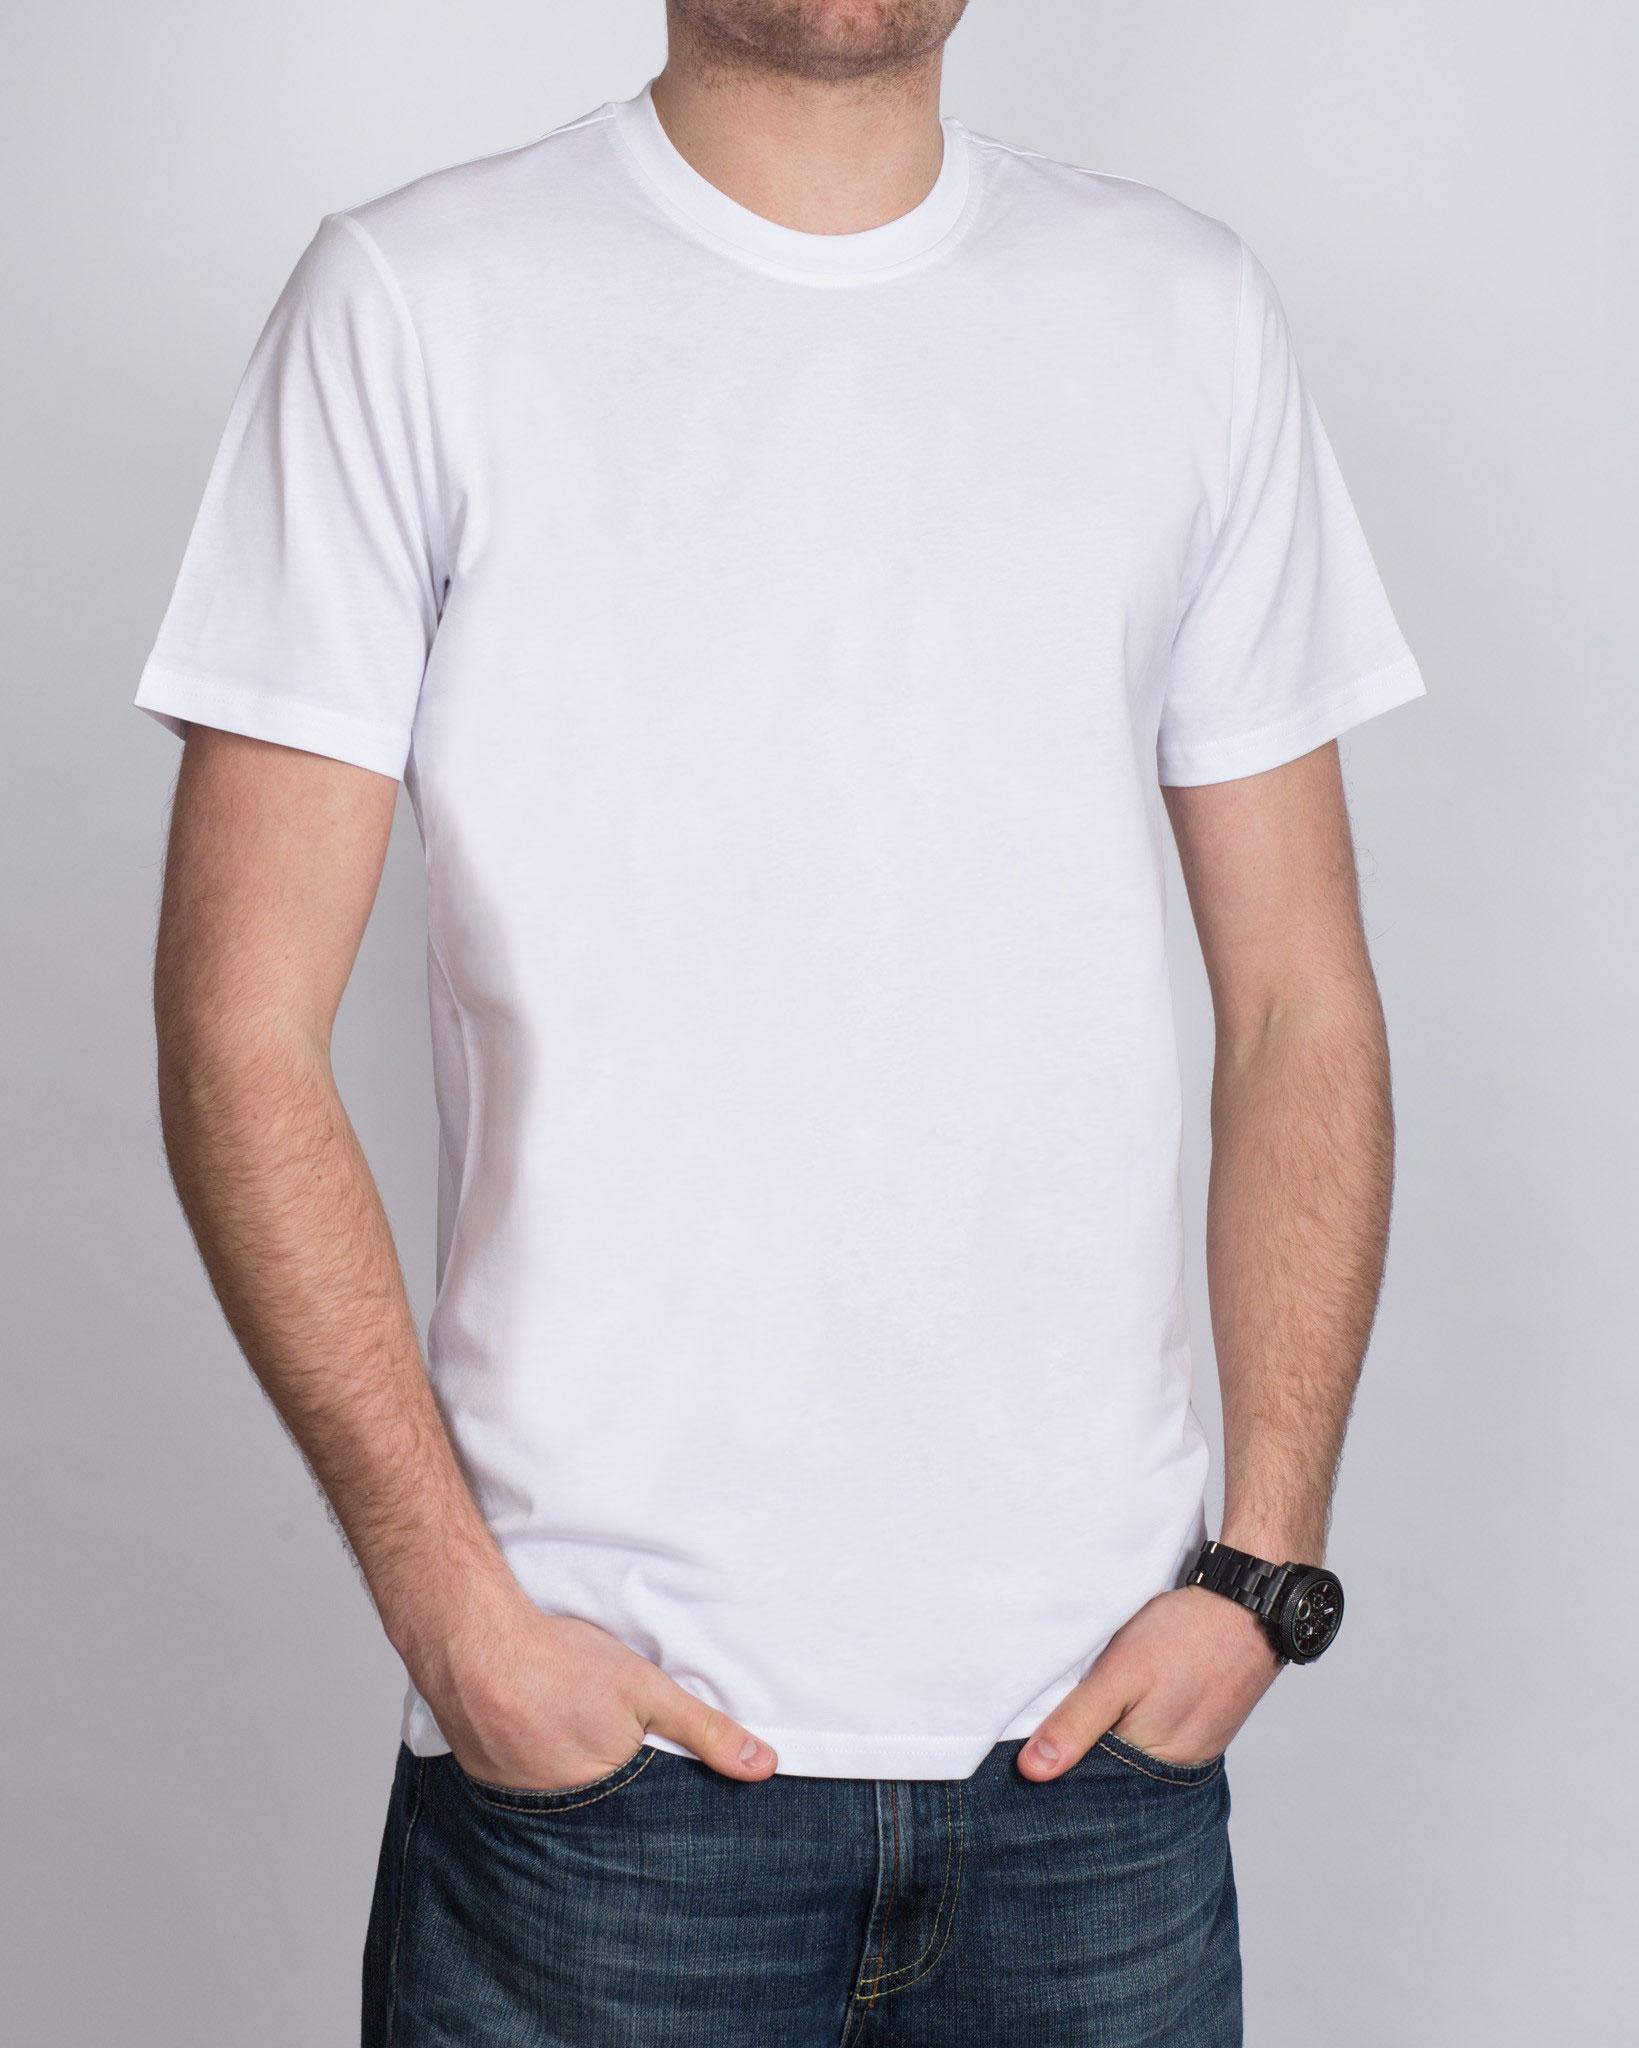 Girav Tall T-Shirt (white) Twin Pack